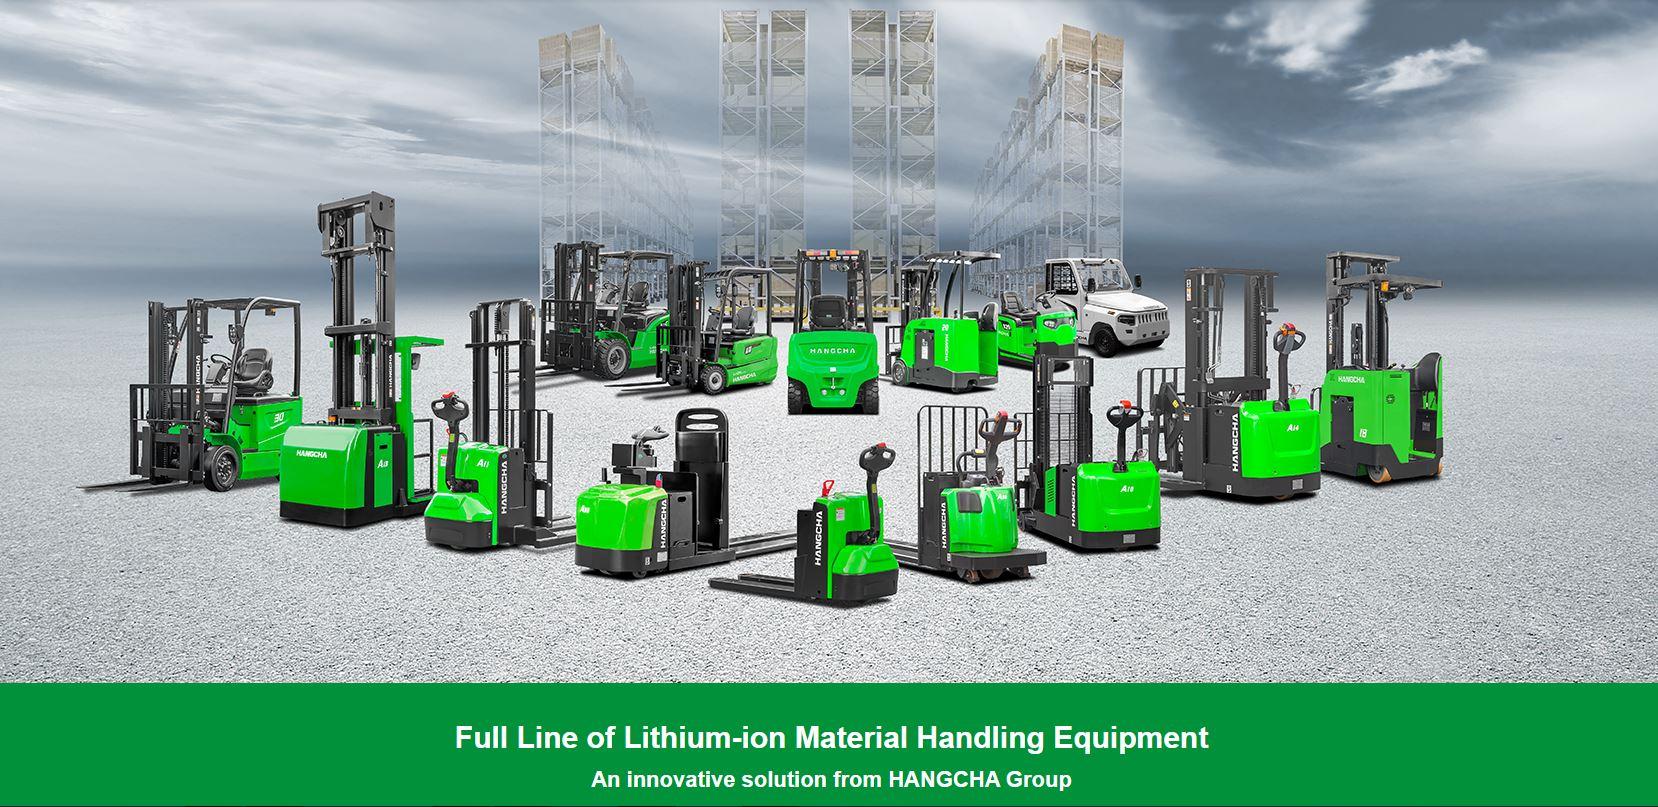 Piedmont Forklift Lithium Ion Products Meet Emission Standards (704) 872-3904